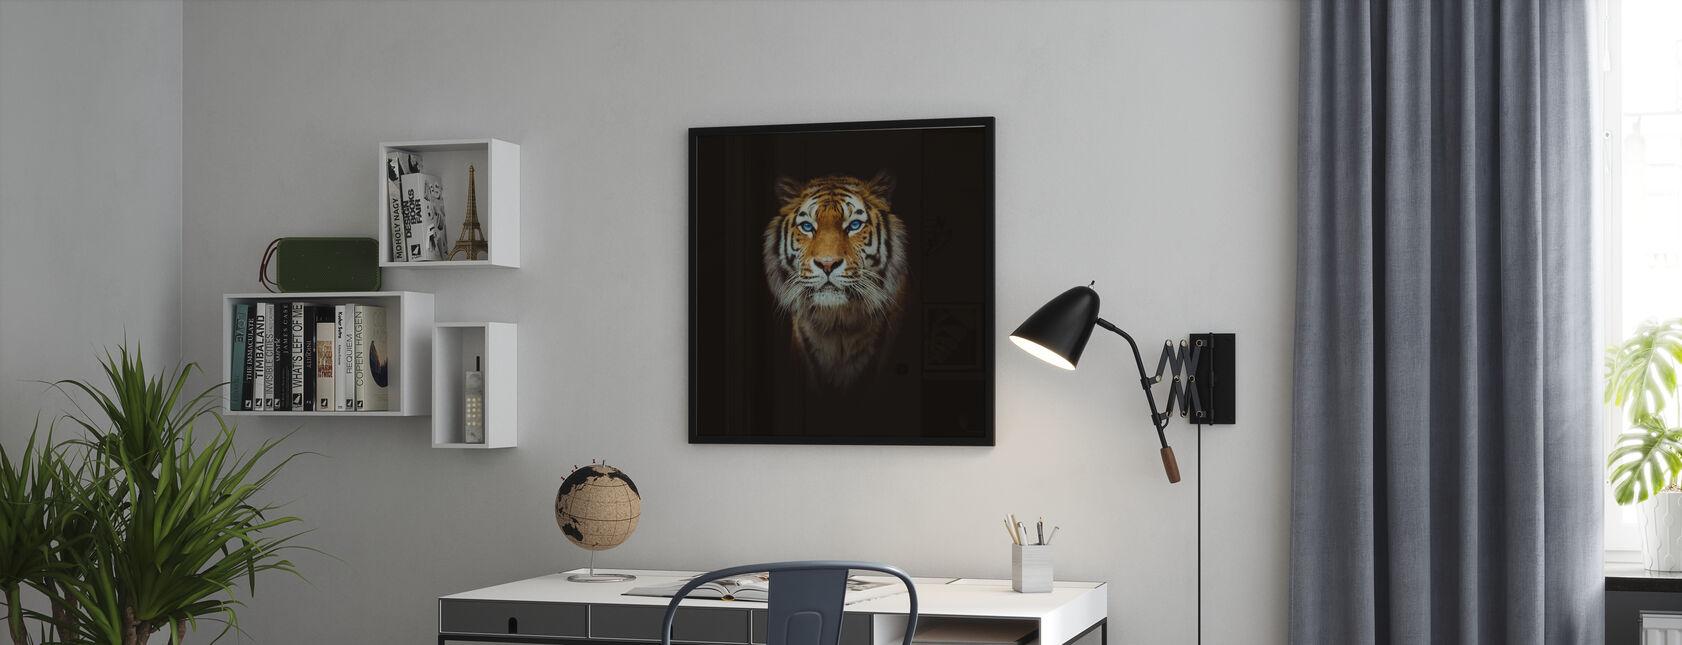 Eye of the Tiger - Framed print - Office